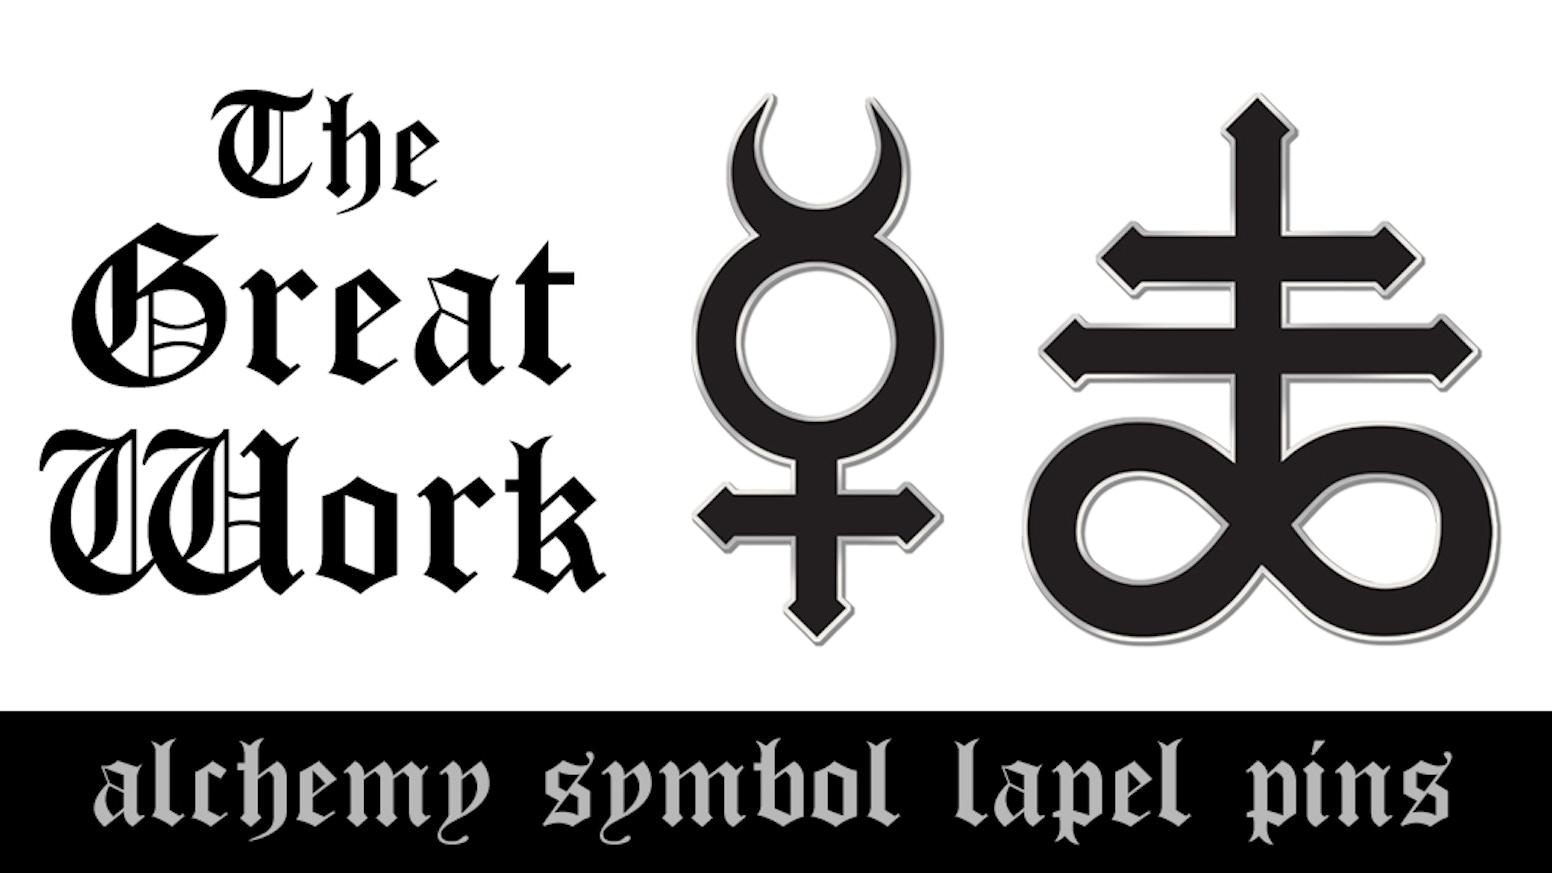 The Great Work Alchemy Symbol Enamel Lapel Pins By Simon Berman